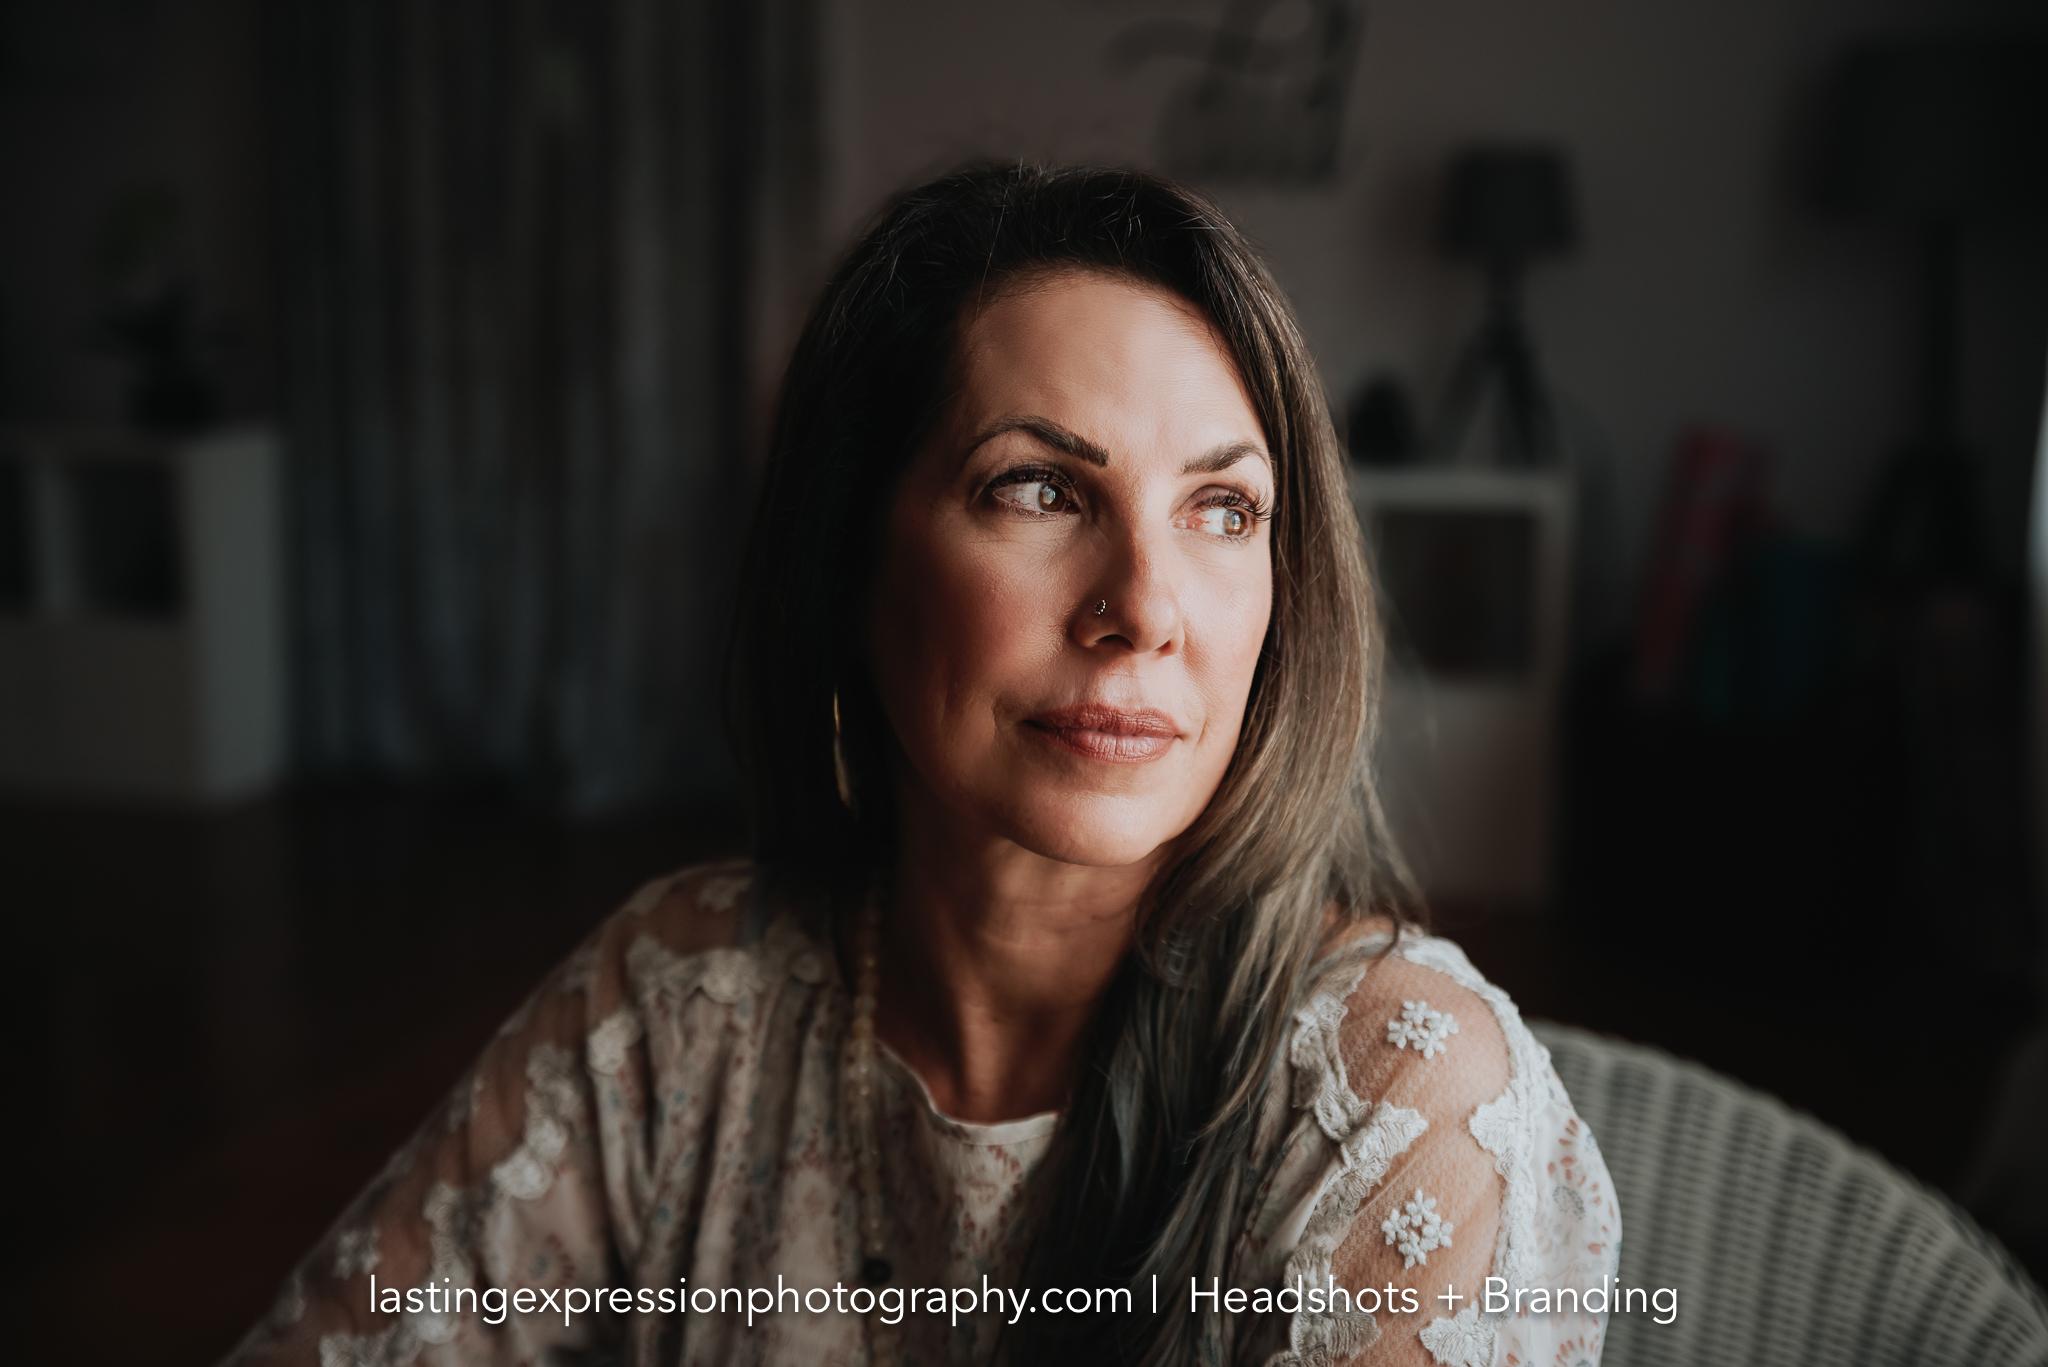 lastingexpressionphotography.com-48.jpg